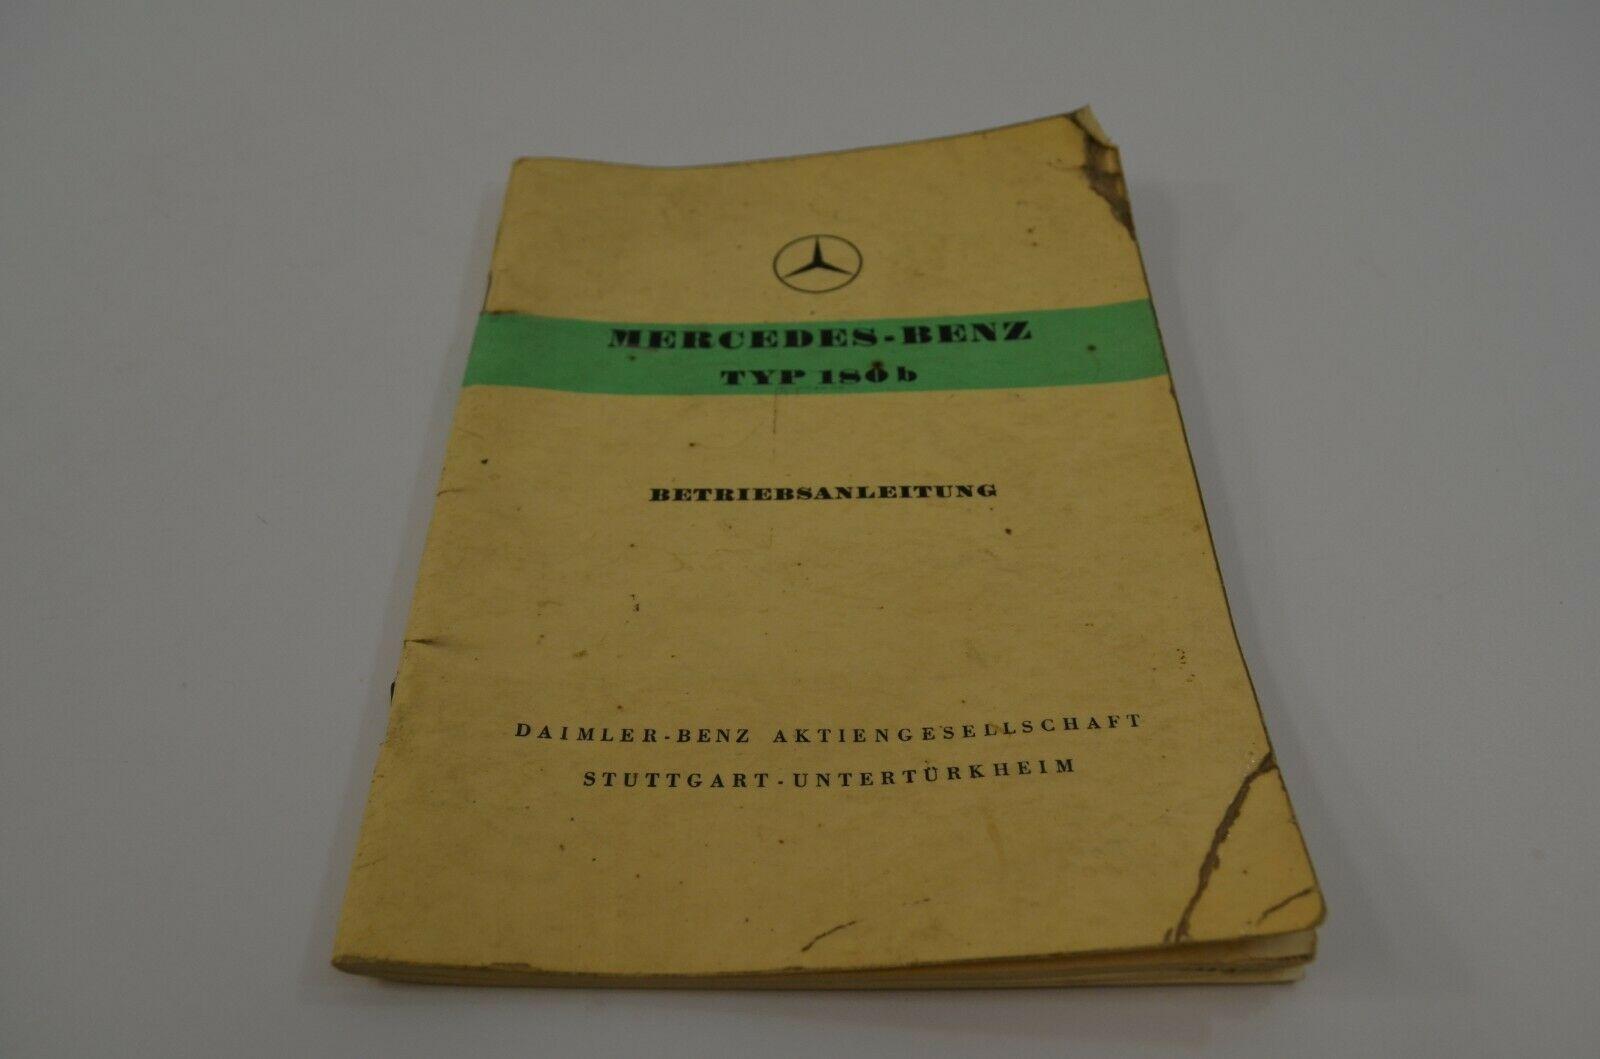 Mercedes Benz Type 180b Typ-180b Betriebsanleitung Owner's Manual 1959 German - $24.18